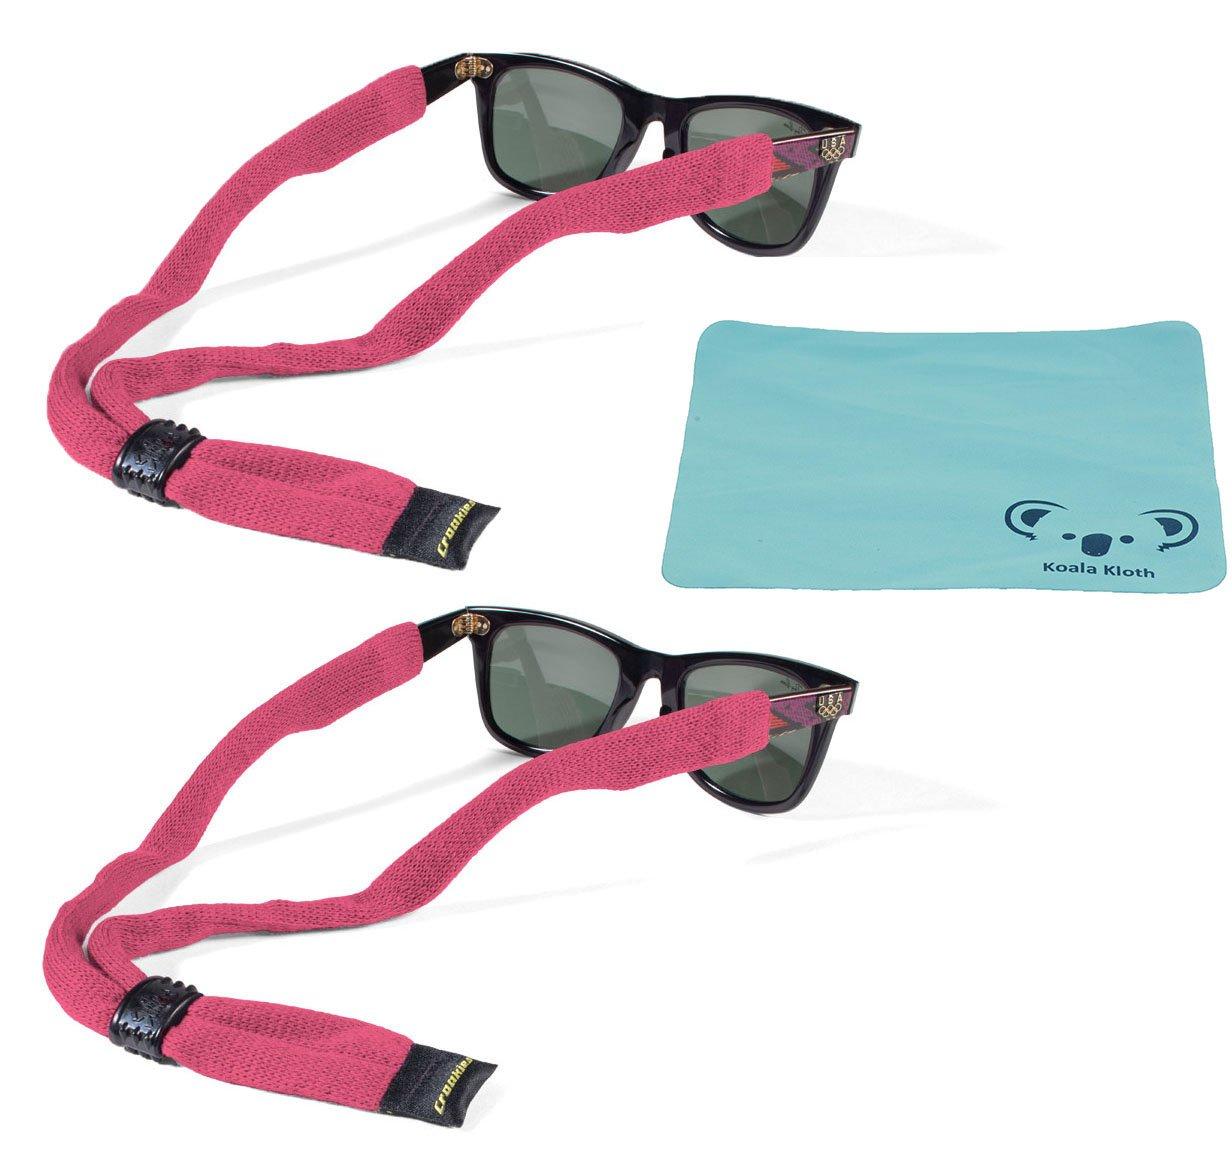 Croakies Kids Cotton Suiter Eyewear Retainer Childrens Glasses Strap   Adjustable Eyeglass and Sunglass Holder   Boys and Girls Sports Use   2pk Bundle + Cloth, Pink